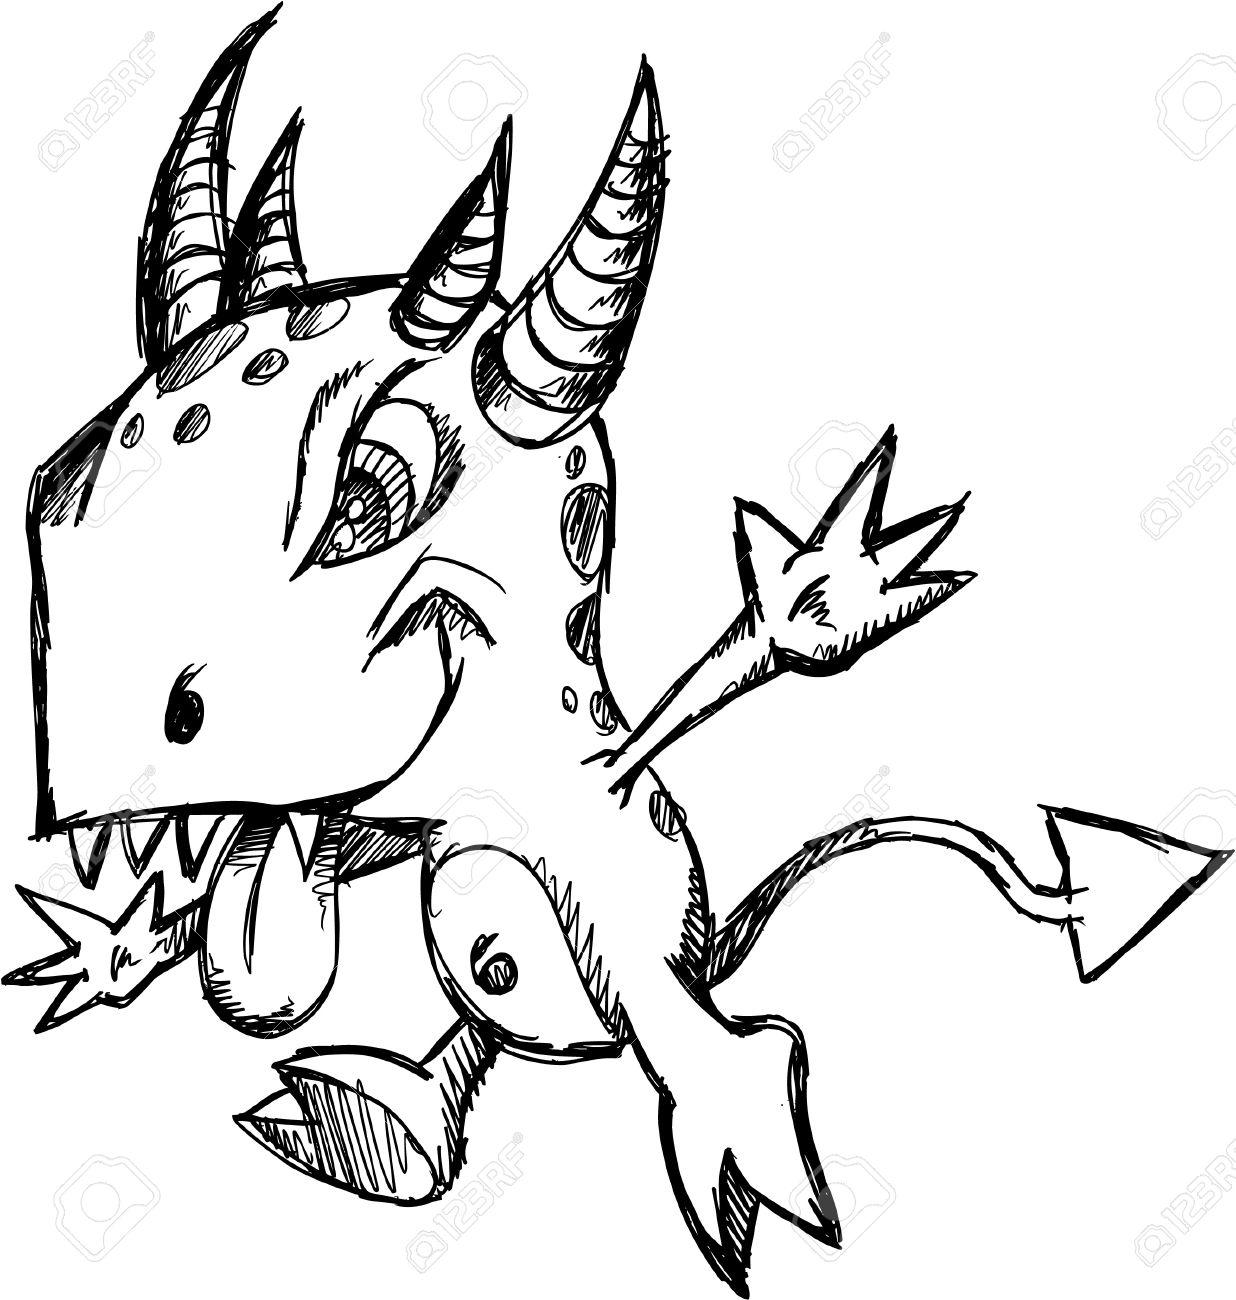 Crazy Insane Sketch Doodle Wild Monster Vector Illustration Cartoon Character Stock